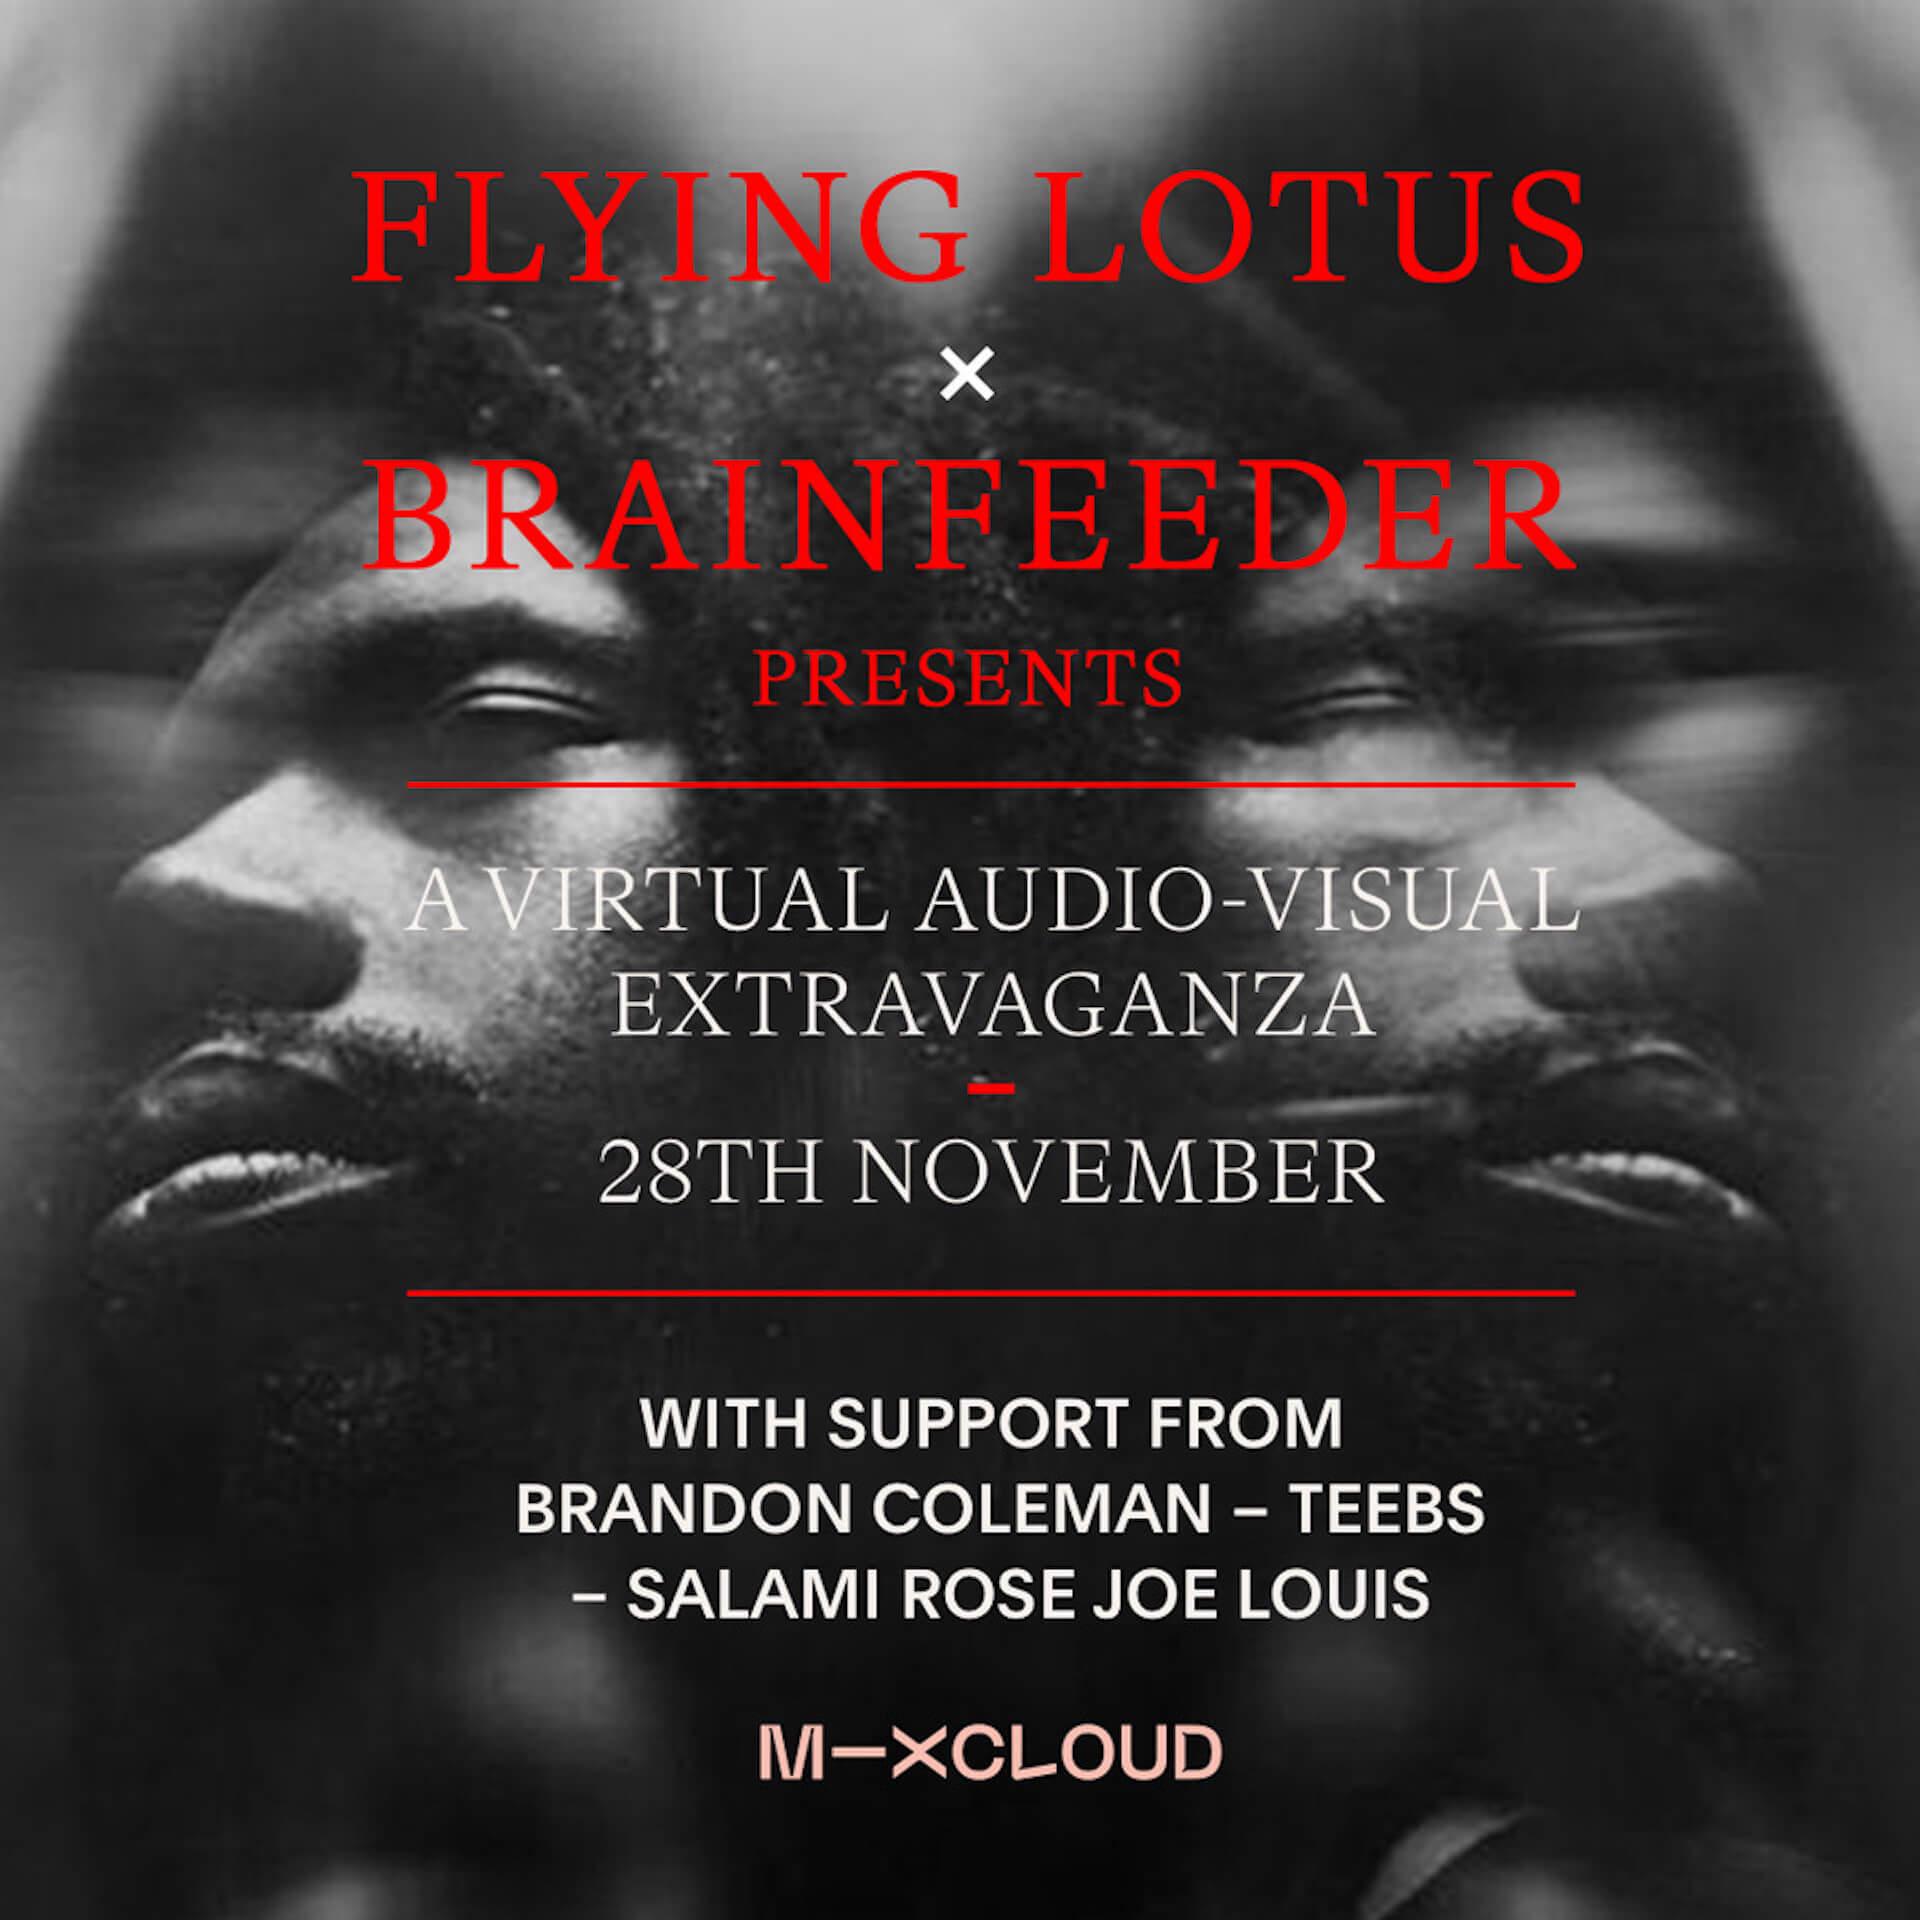 Flying Lotus主宰の〈Brainfeeder〉A/Vスペシャルライブ<EXTRAVAGANZA>の配信を発表!Brandon Colemanらも出演 music201106_flyinglotus_8